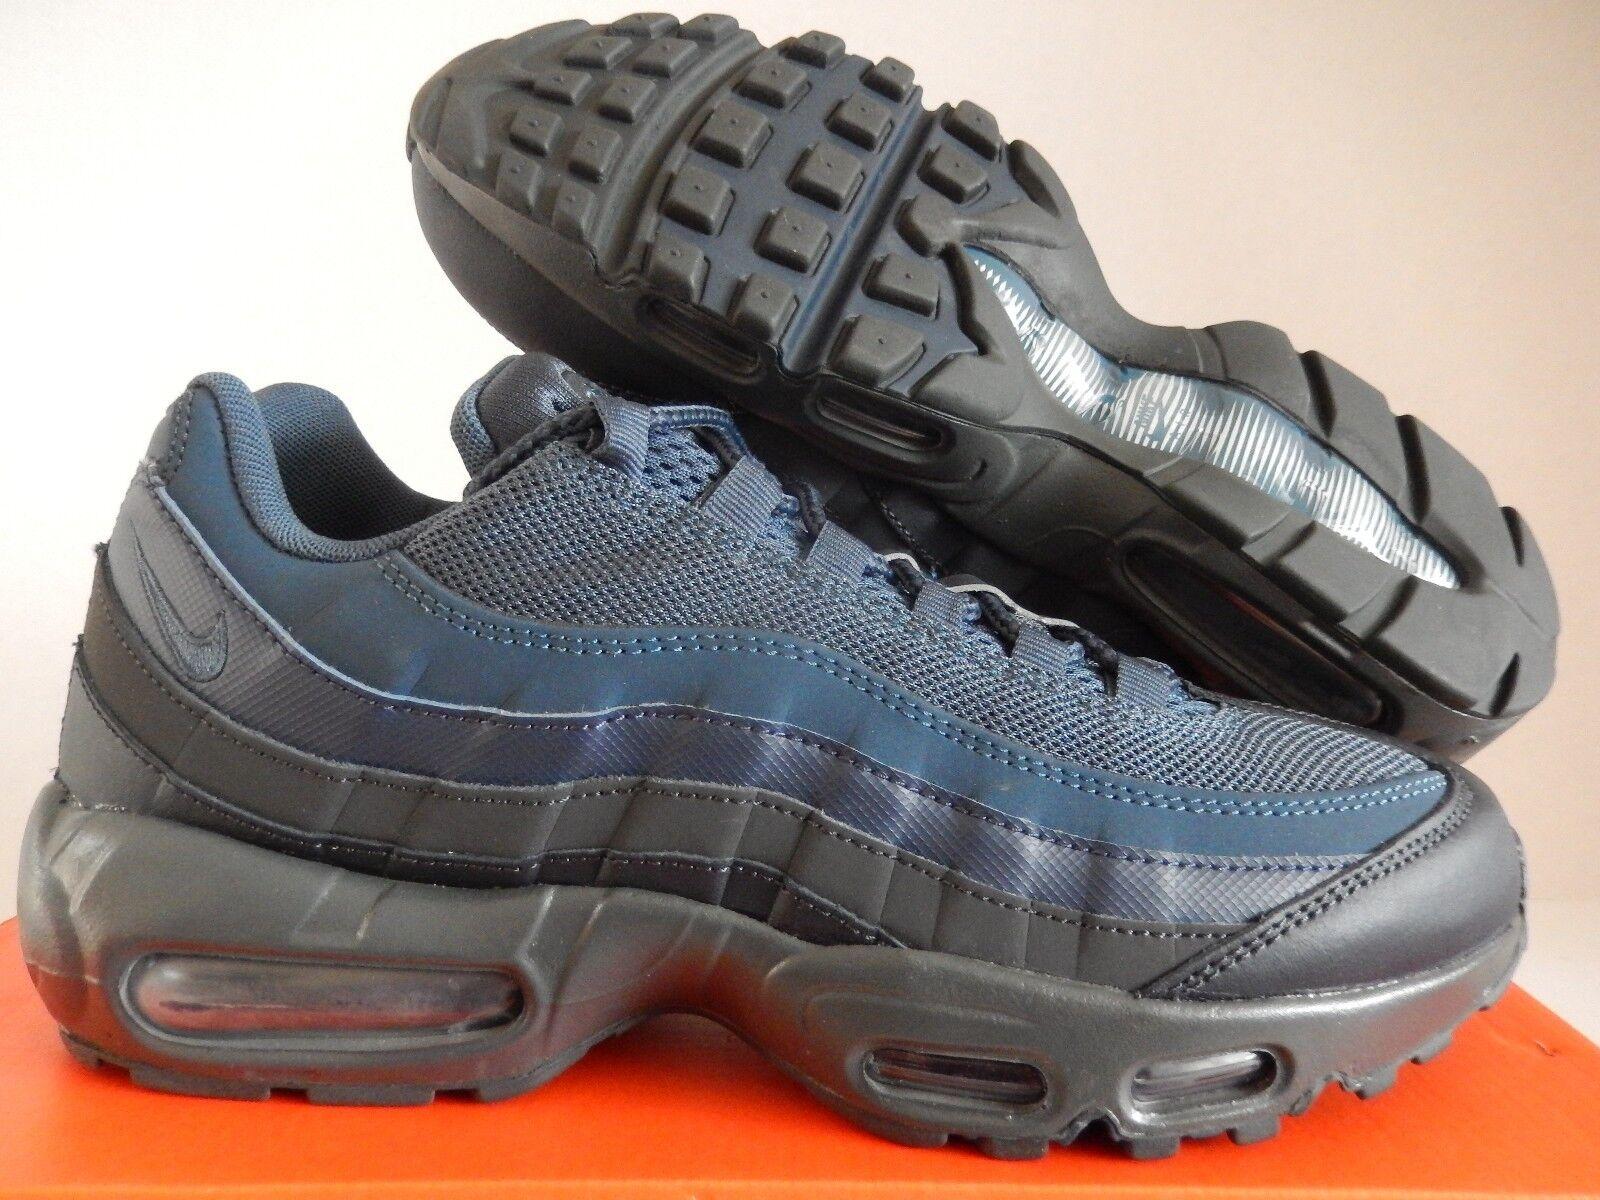 Nike air max 95 9 marine Blau-schwarz-dark grauen sz 9 95 [749766-400] e032f7